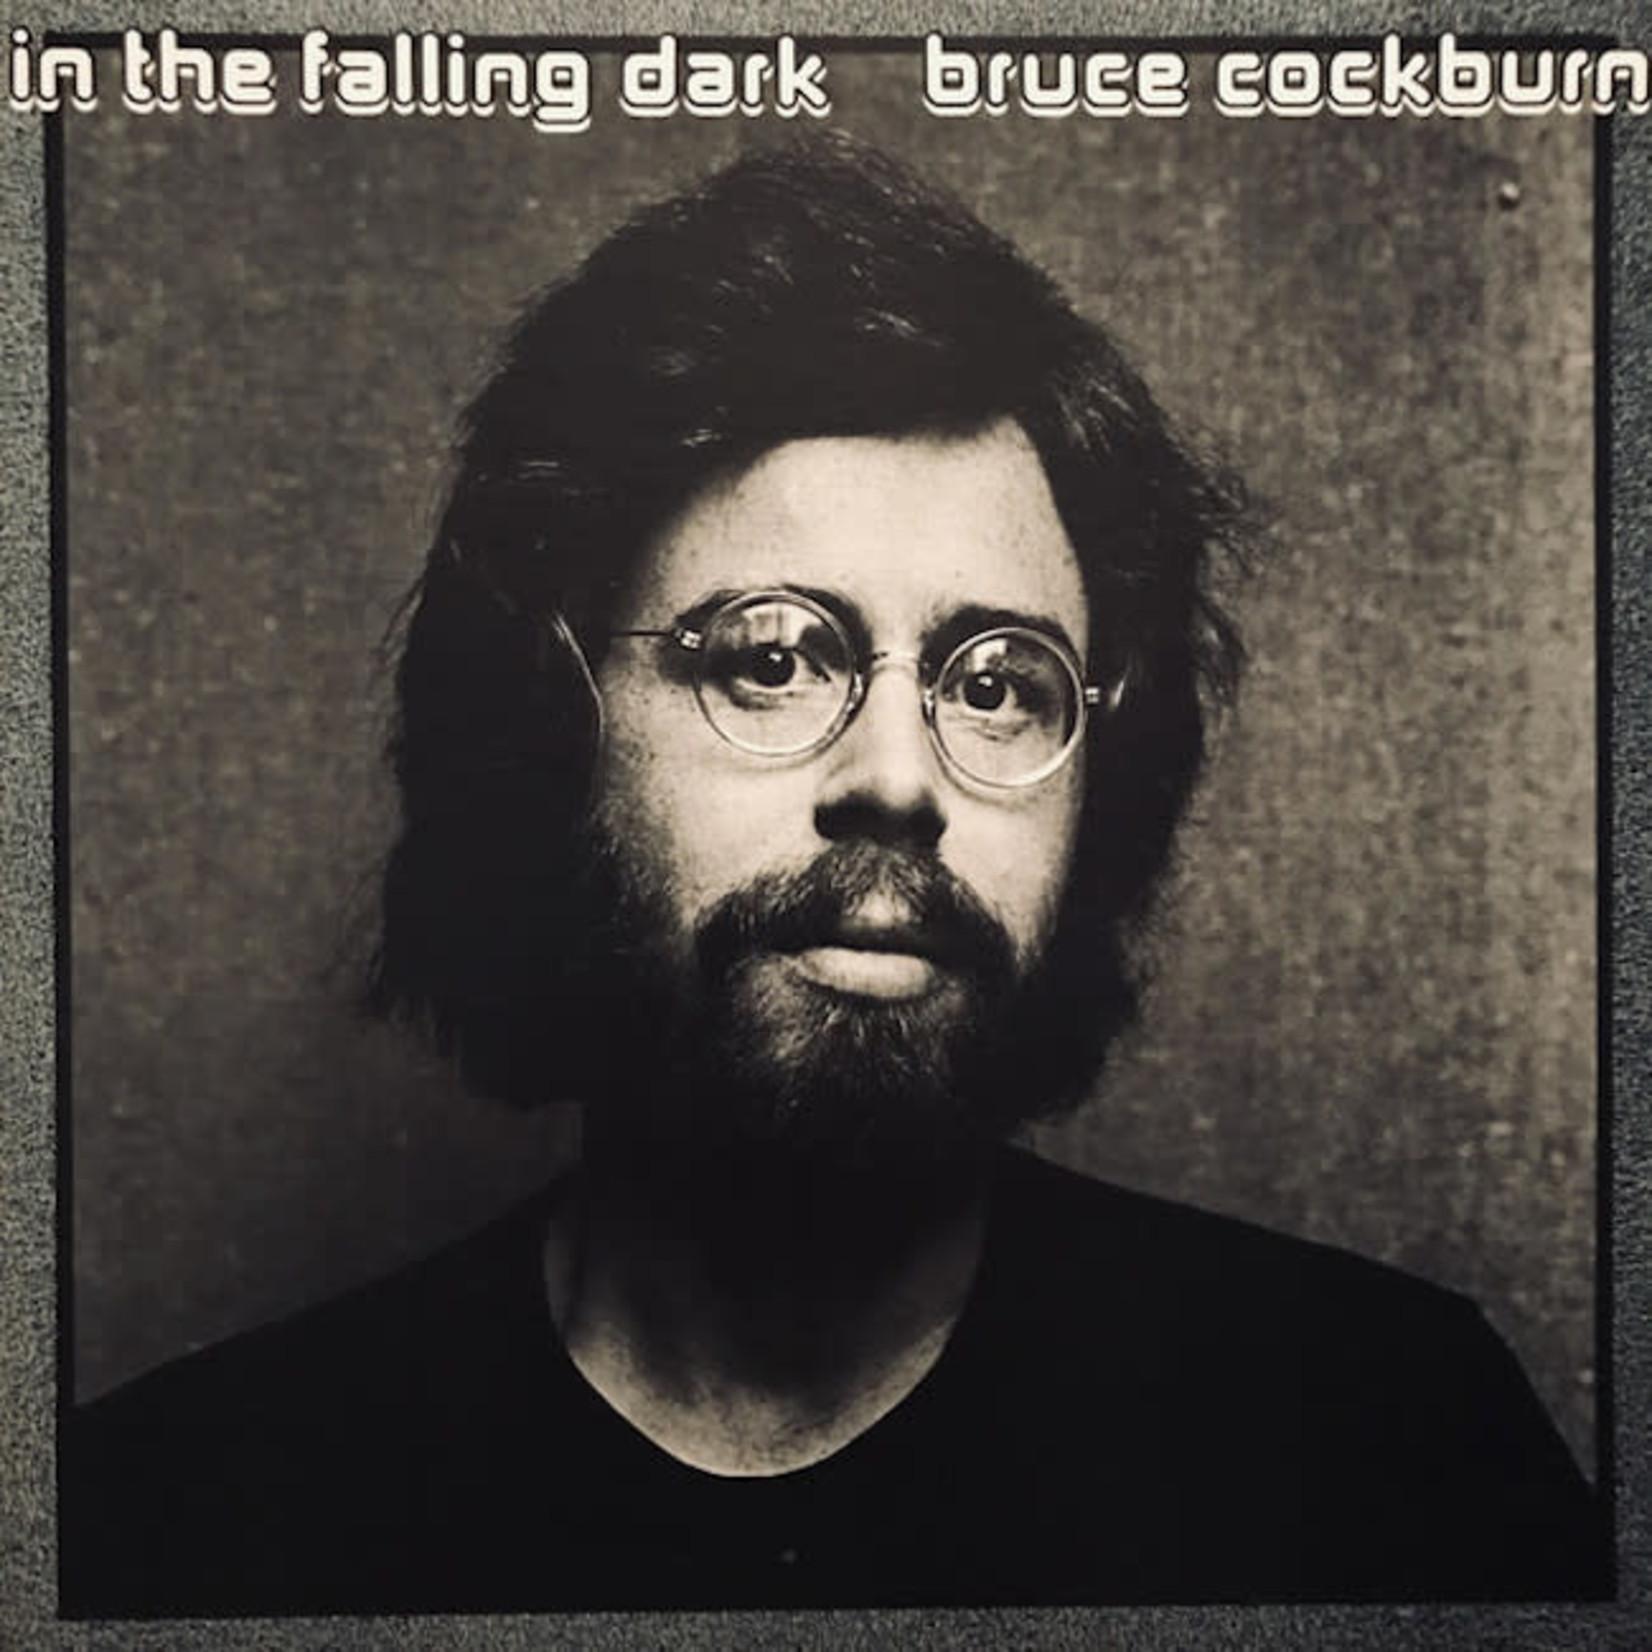 [Vintage] Cockburn, Bruce: In the Falling Dark